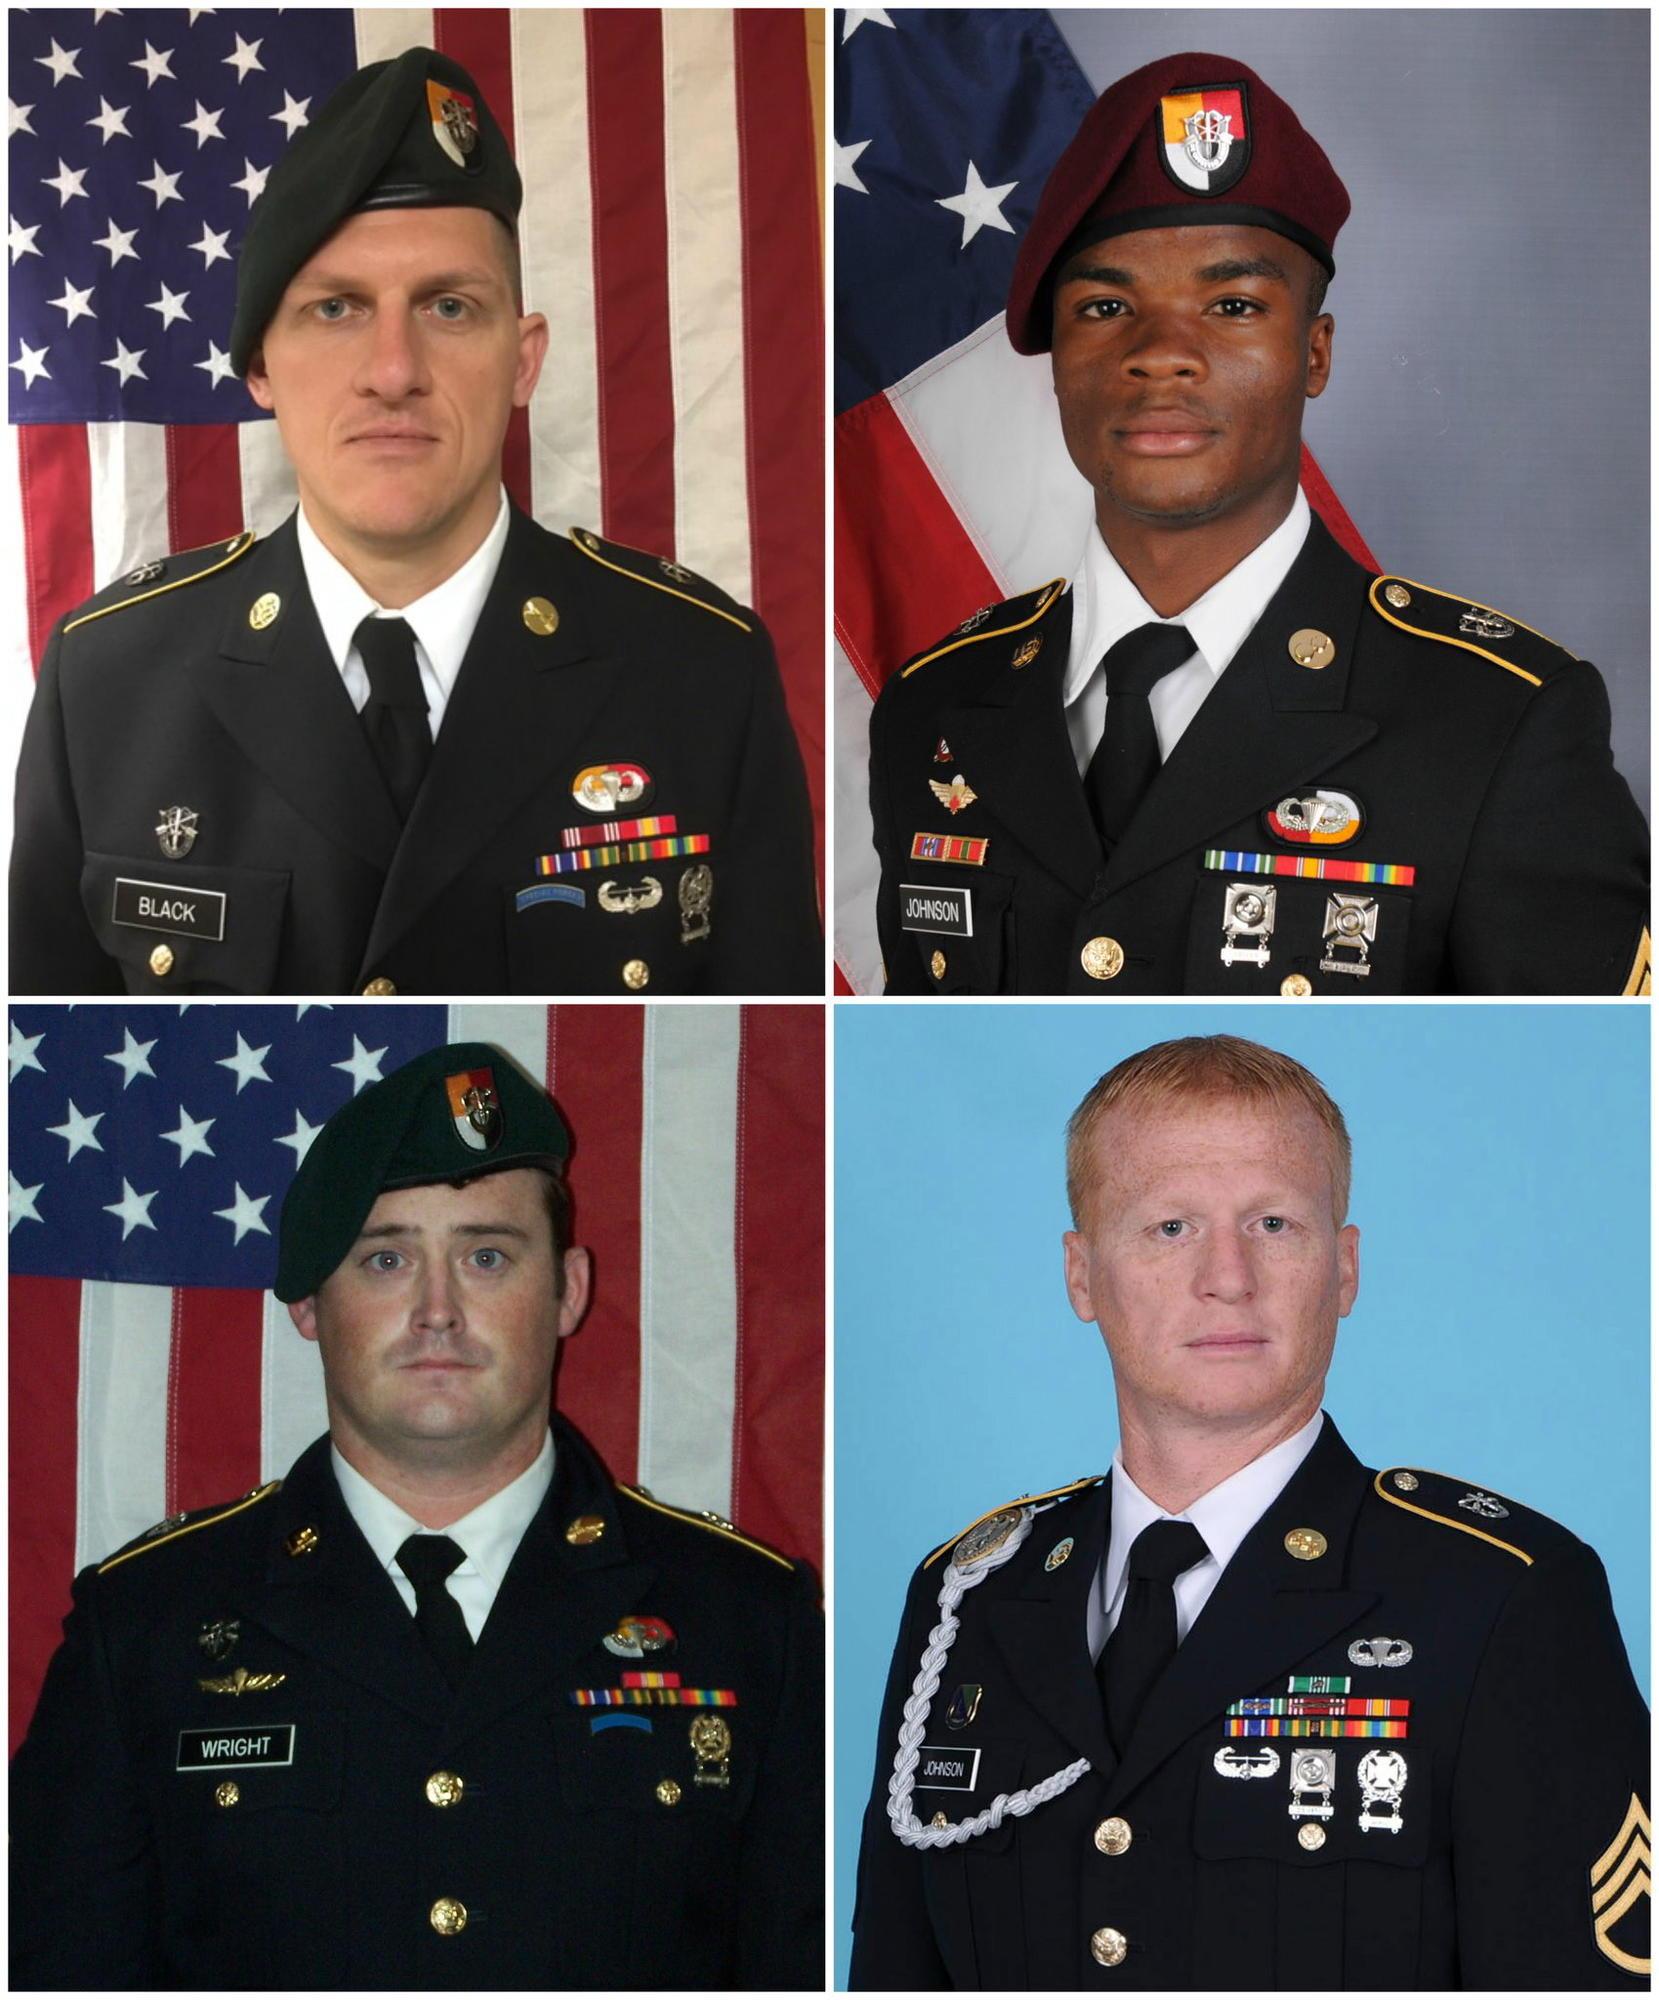 Clockwise from upper left: Army Staff Sgt. Bryan C. Black, 35; Sgt. La David Johnson, 25; Staff Sgt. Jeremiah W. Johnson, 39; and Staff Sgt. Dustin M. Wright, 29.